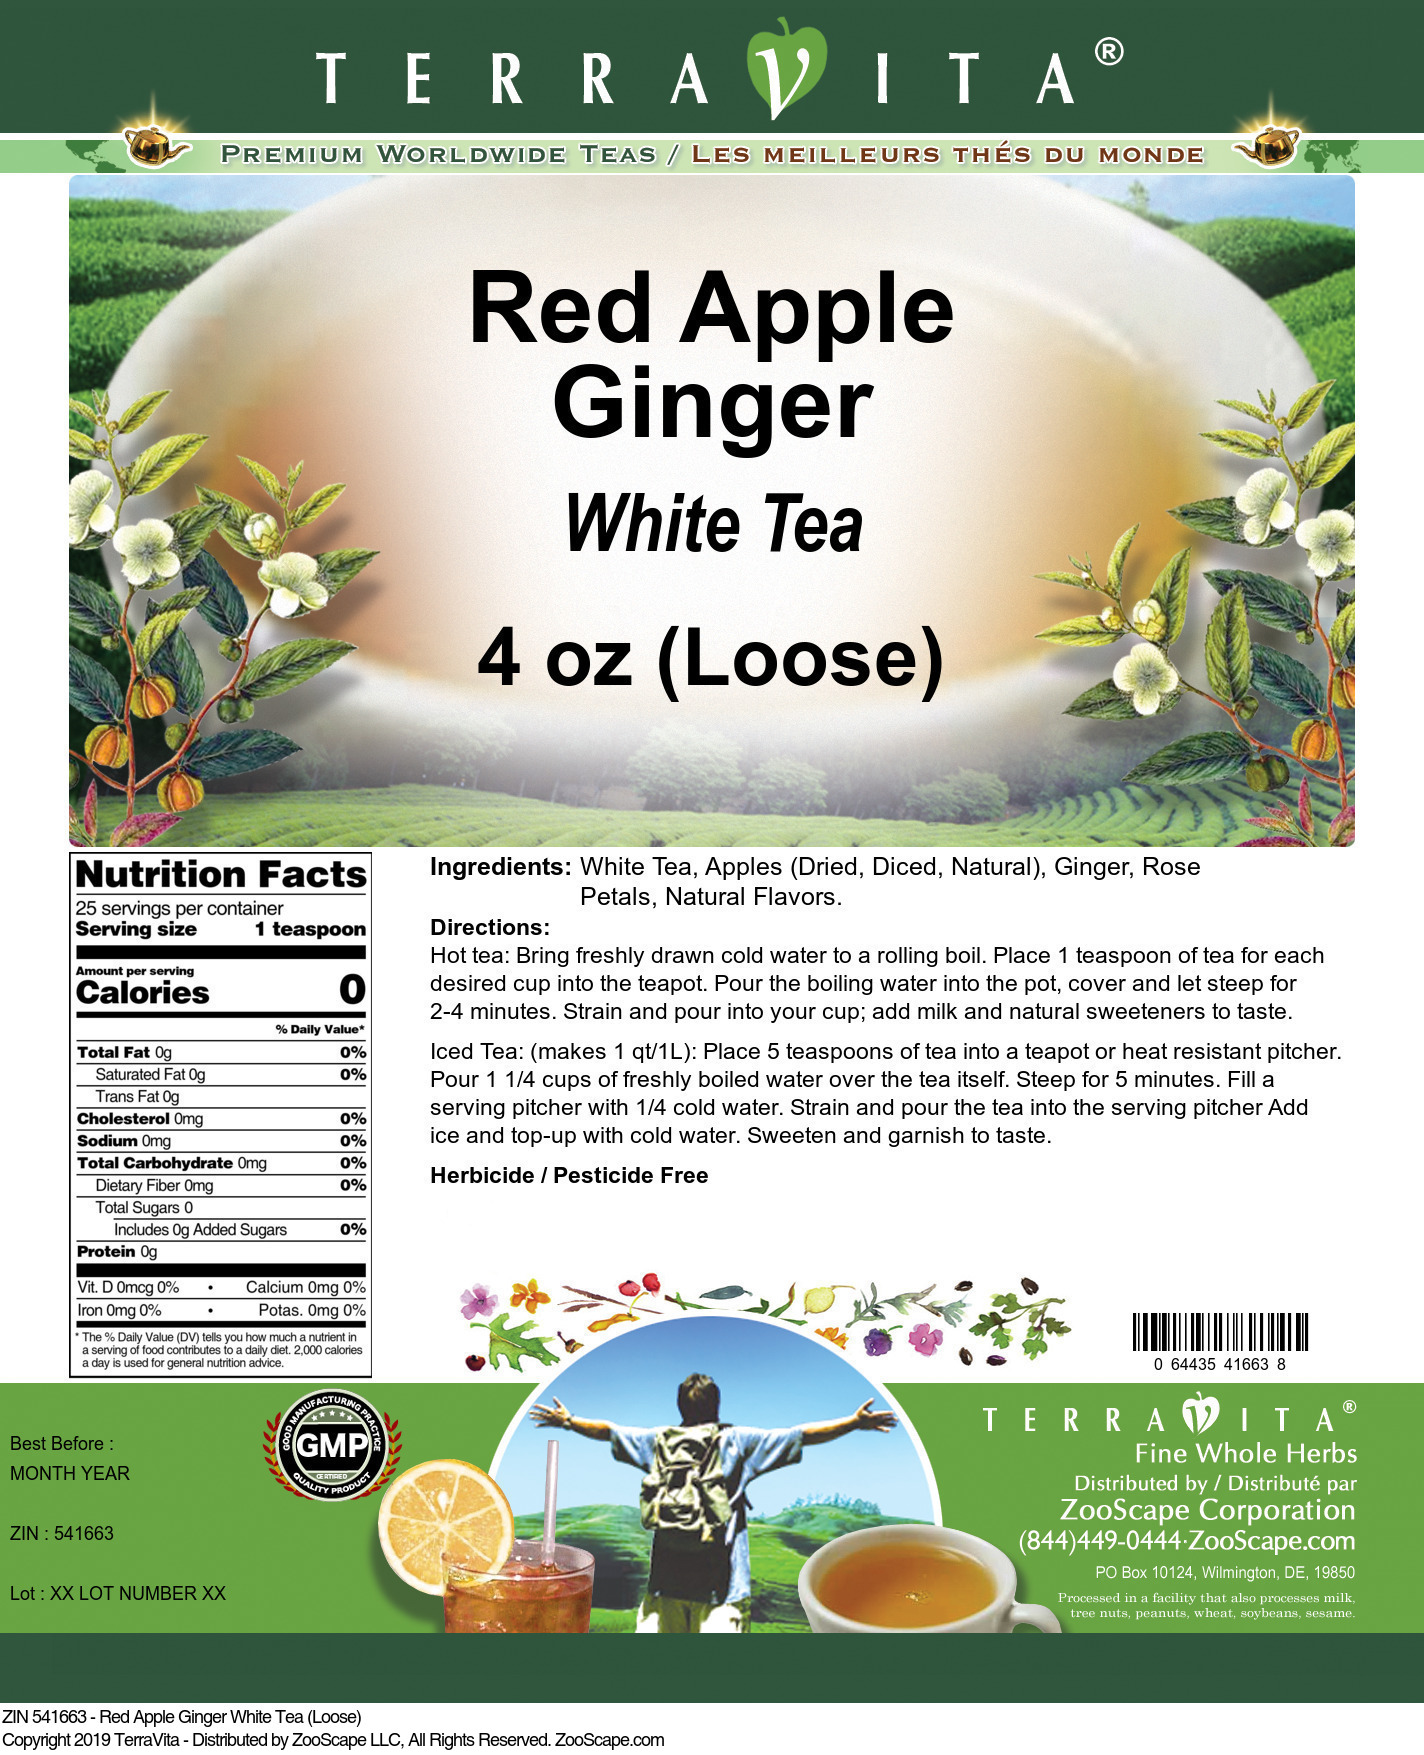 Red Apple Ginger White Tea (Loose)